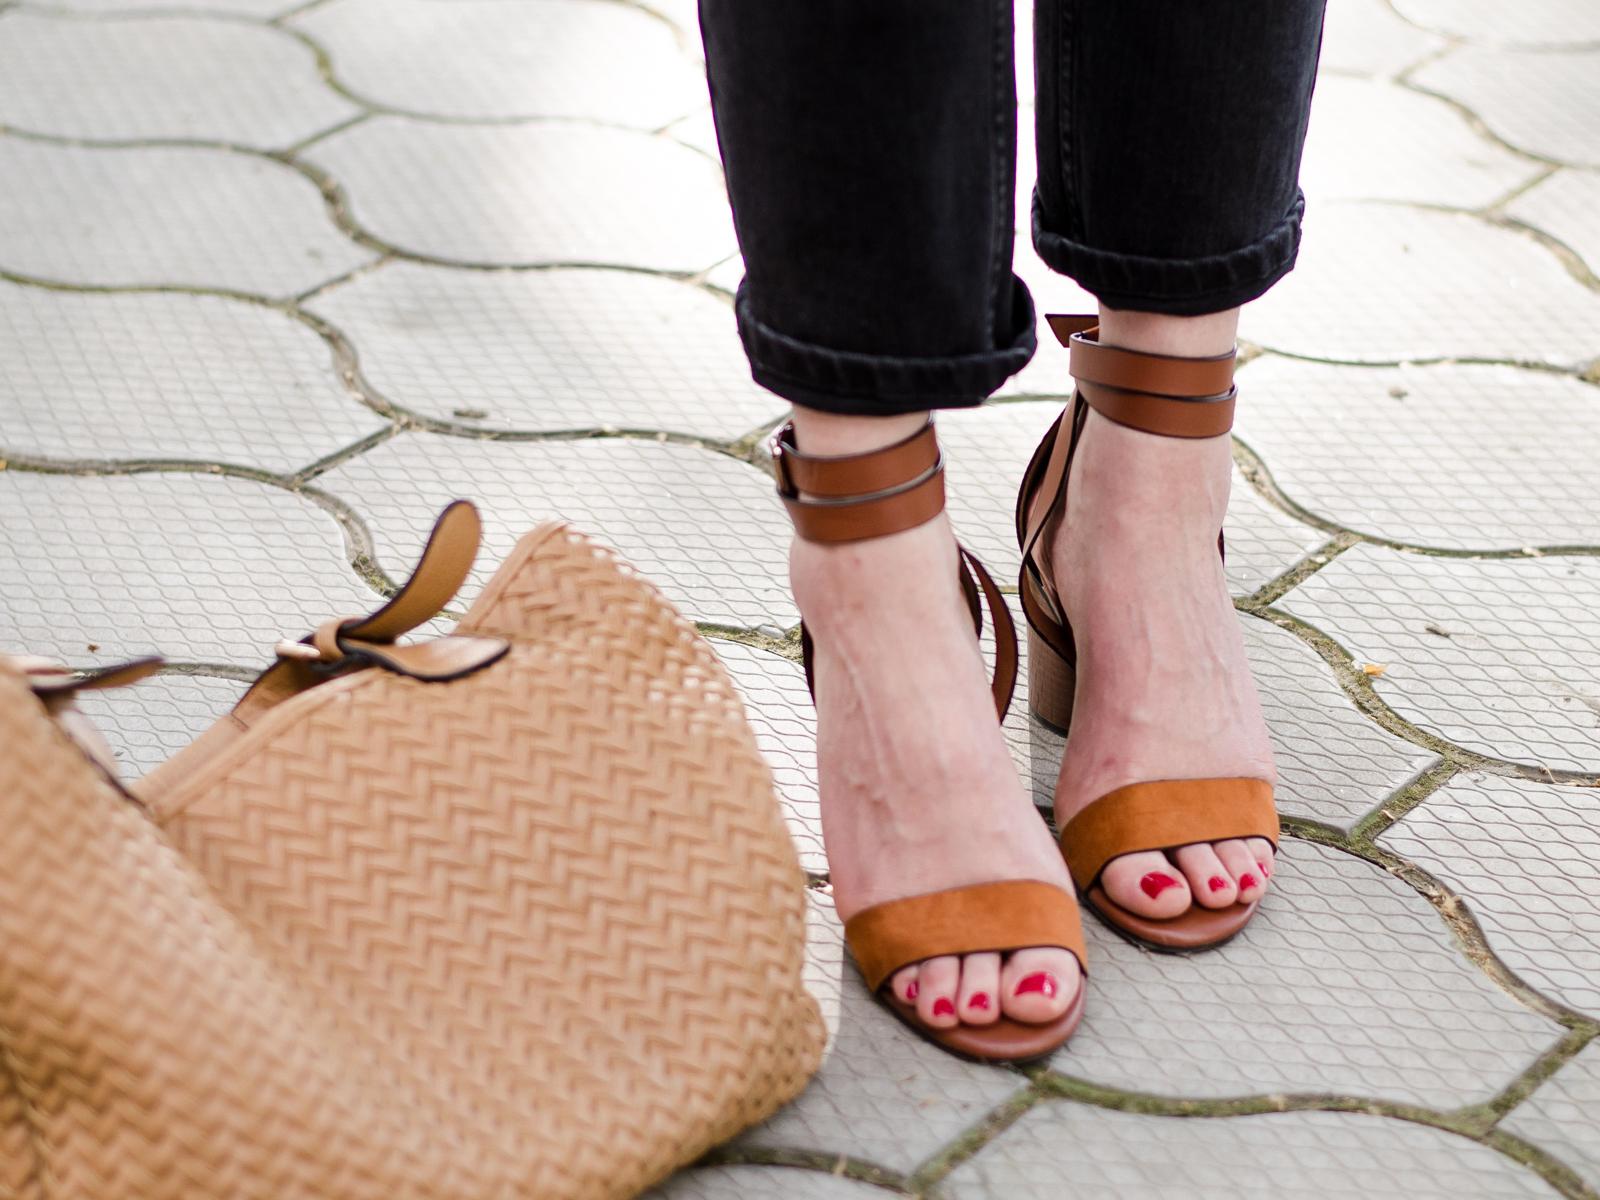 fashion%2Bblogger%2Bdiyorasnotes%2Bdiyora%2Bbeta%2Boutfitoftheday%2Bromper%2Bcoral%2Btop%2Bripped%2Bjeans%2Basos%2Bheels%2B 22 - CORAL TOP